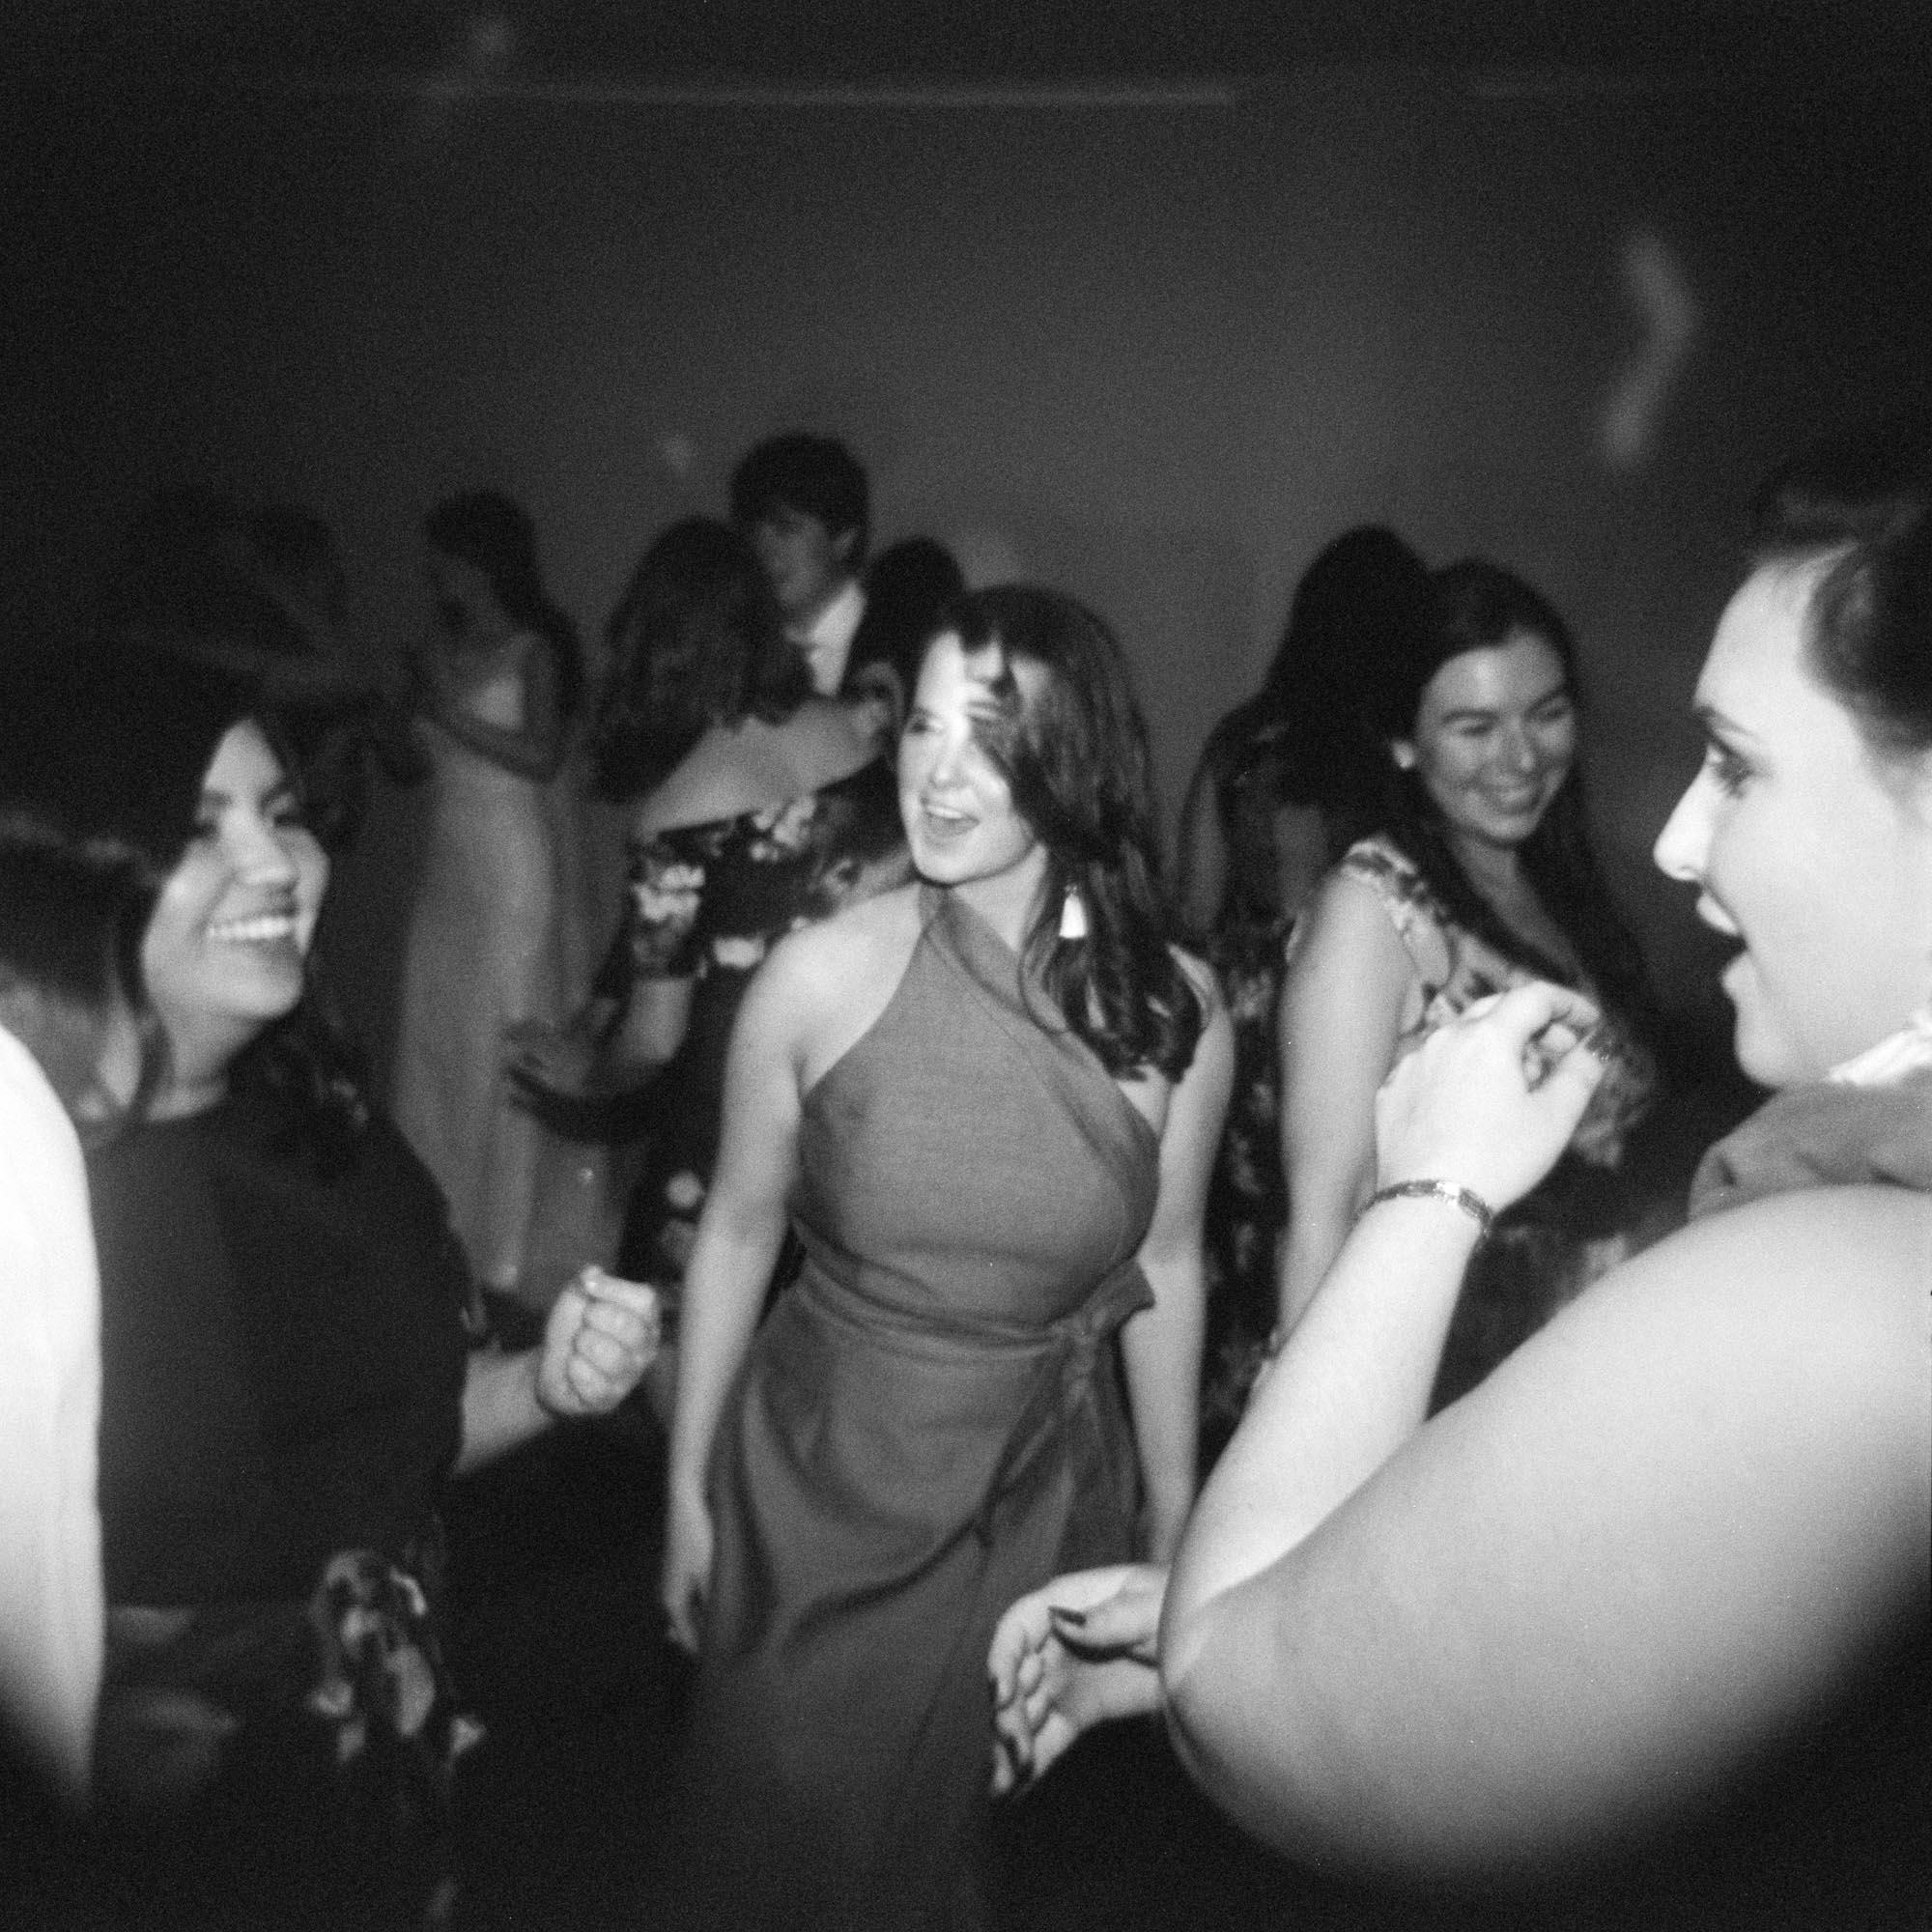 Glen-Ewin-Estate-wedding-photography-107.jpg